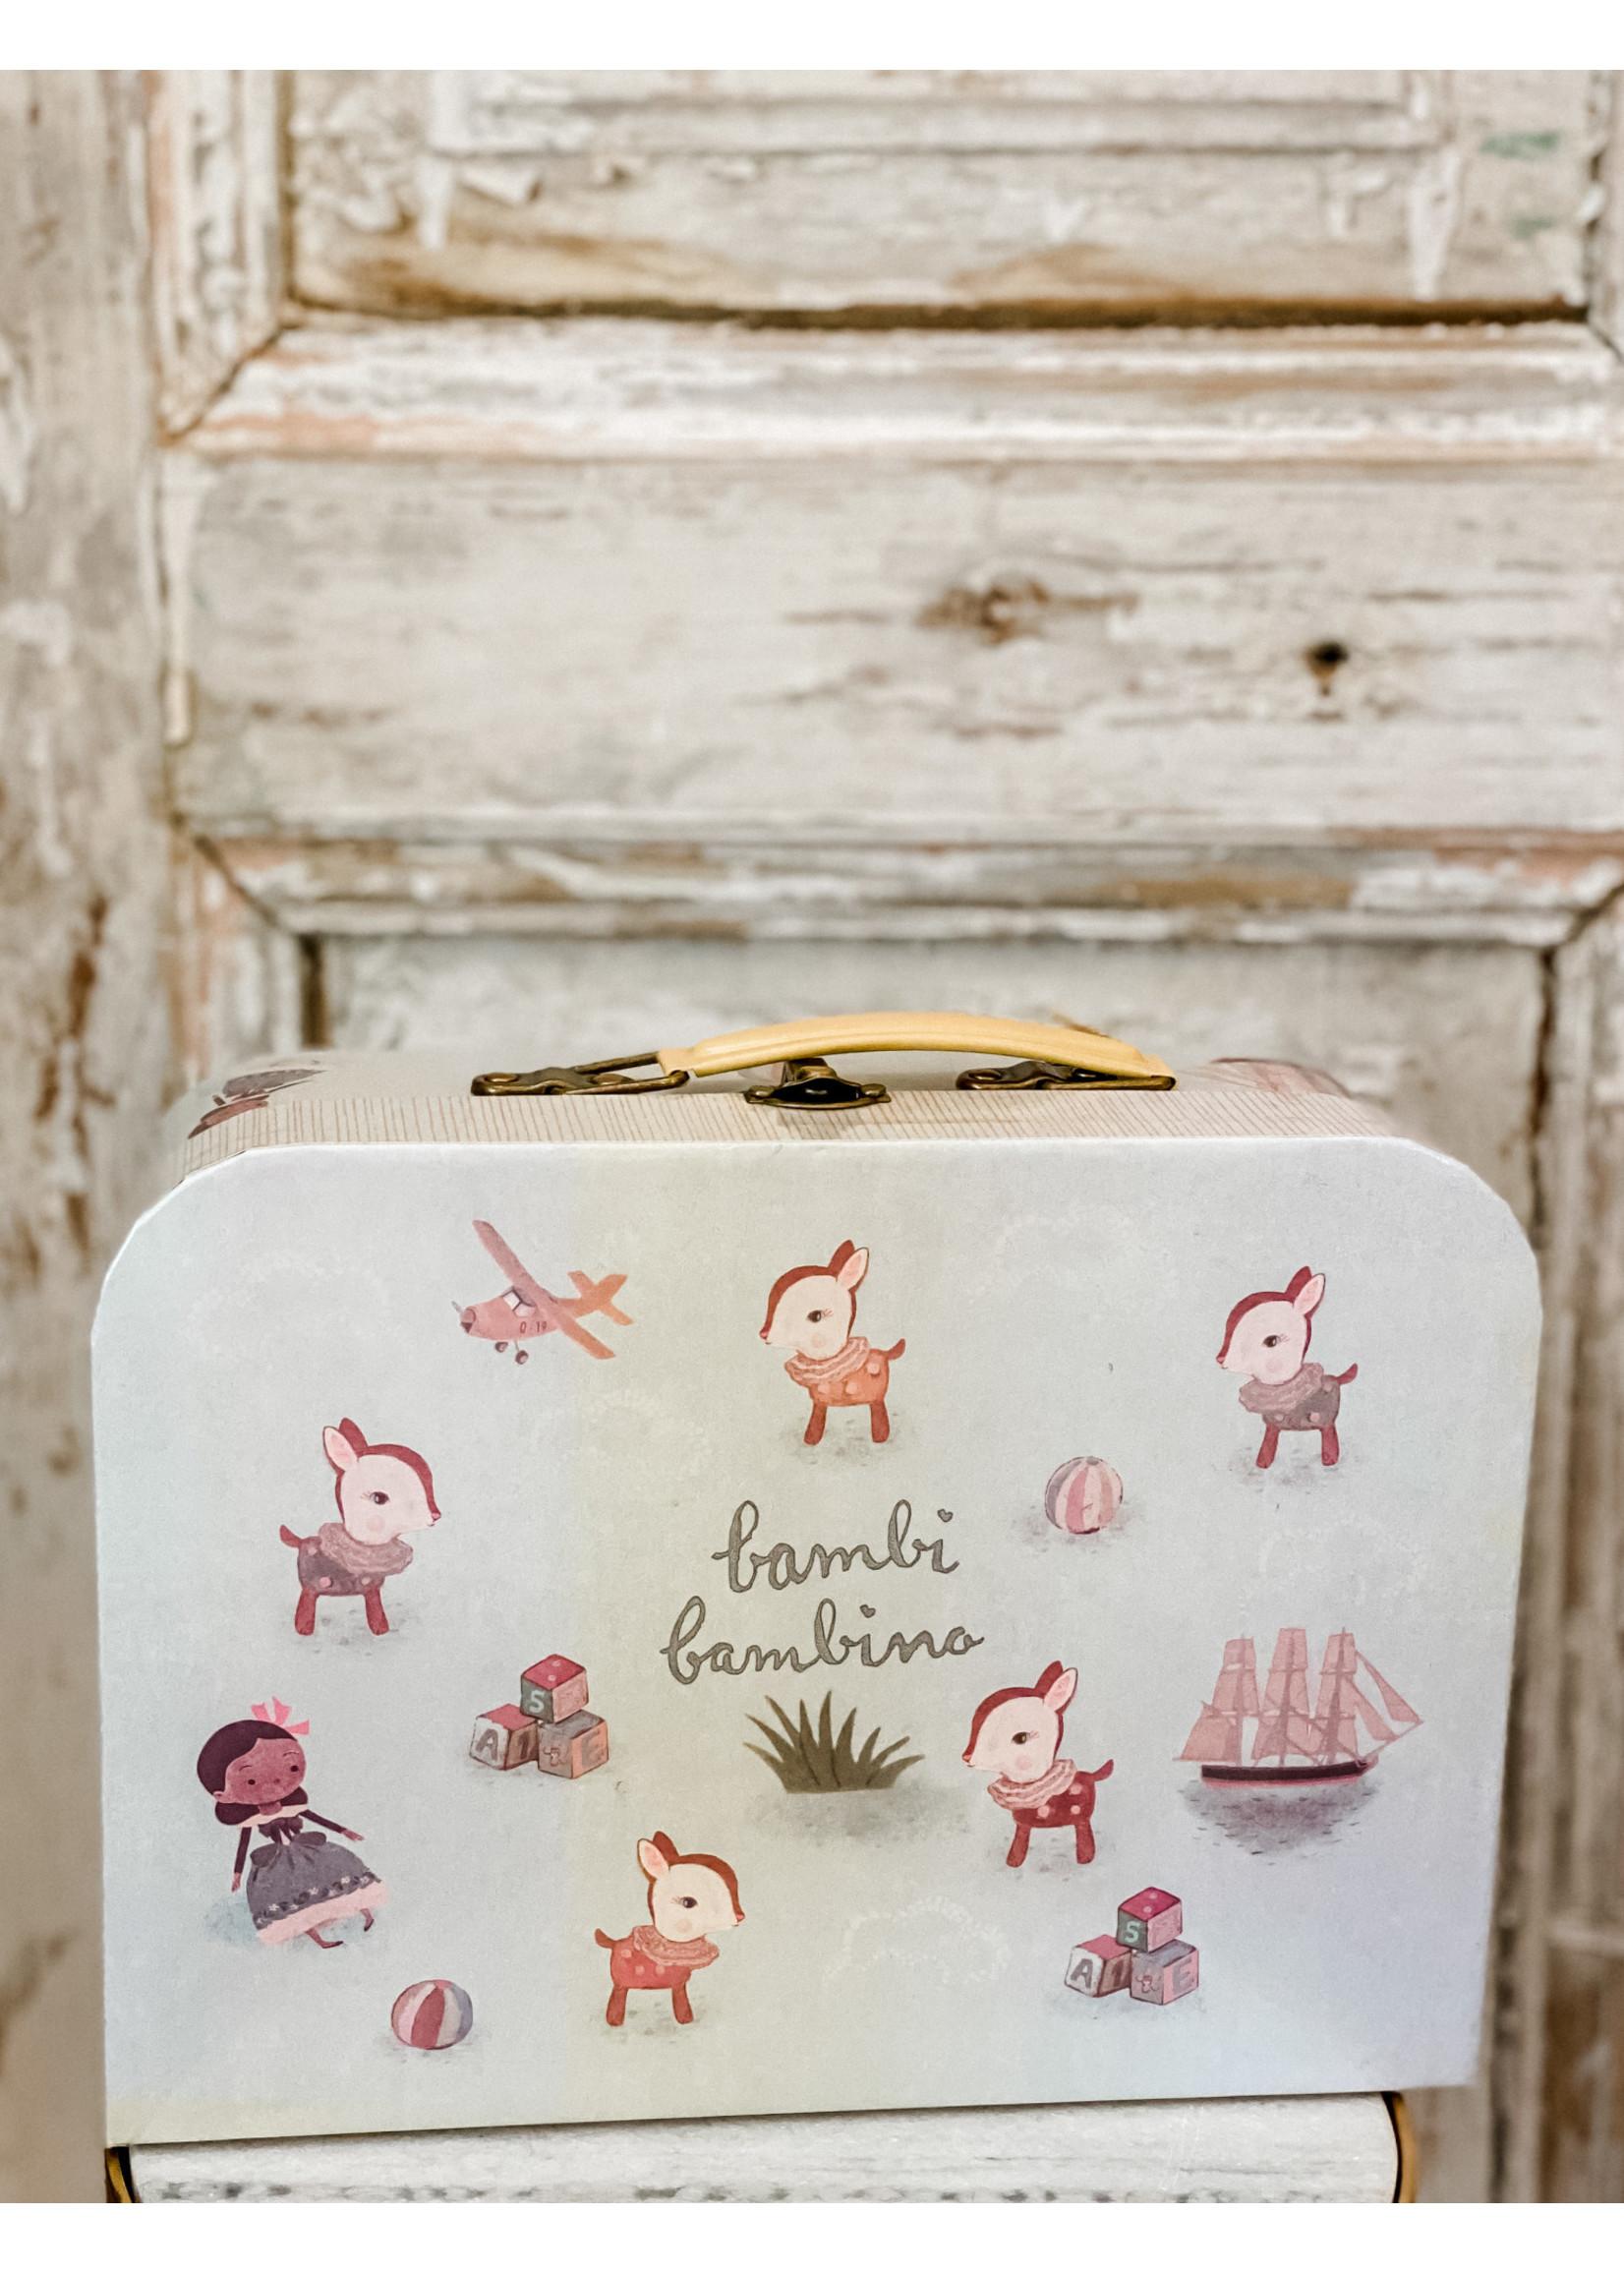 Maileg Bambi Bambino Suitcase